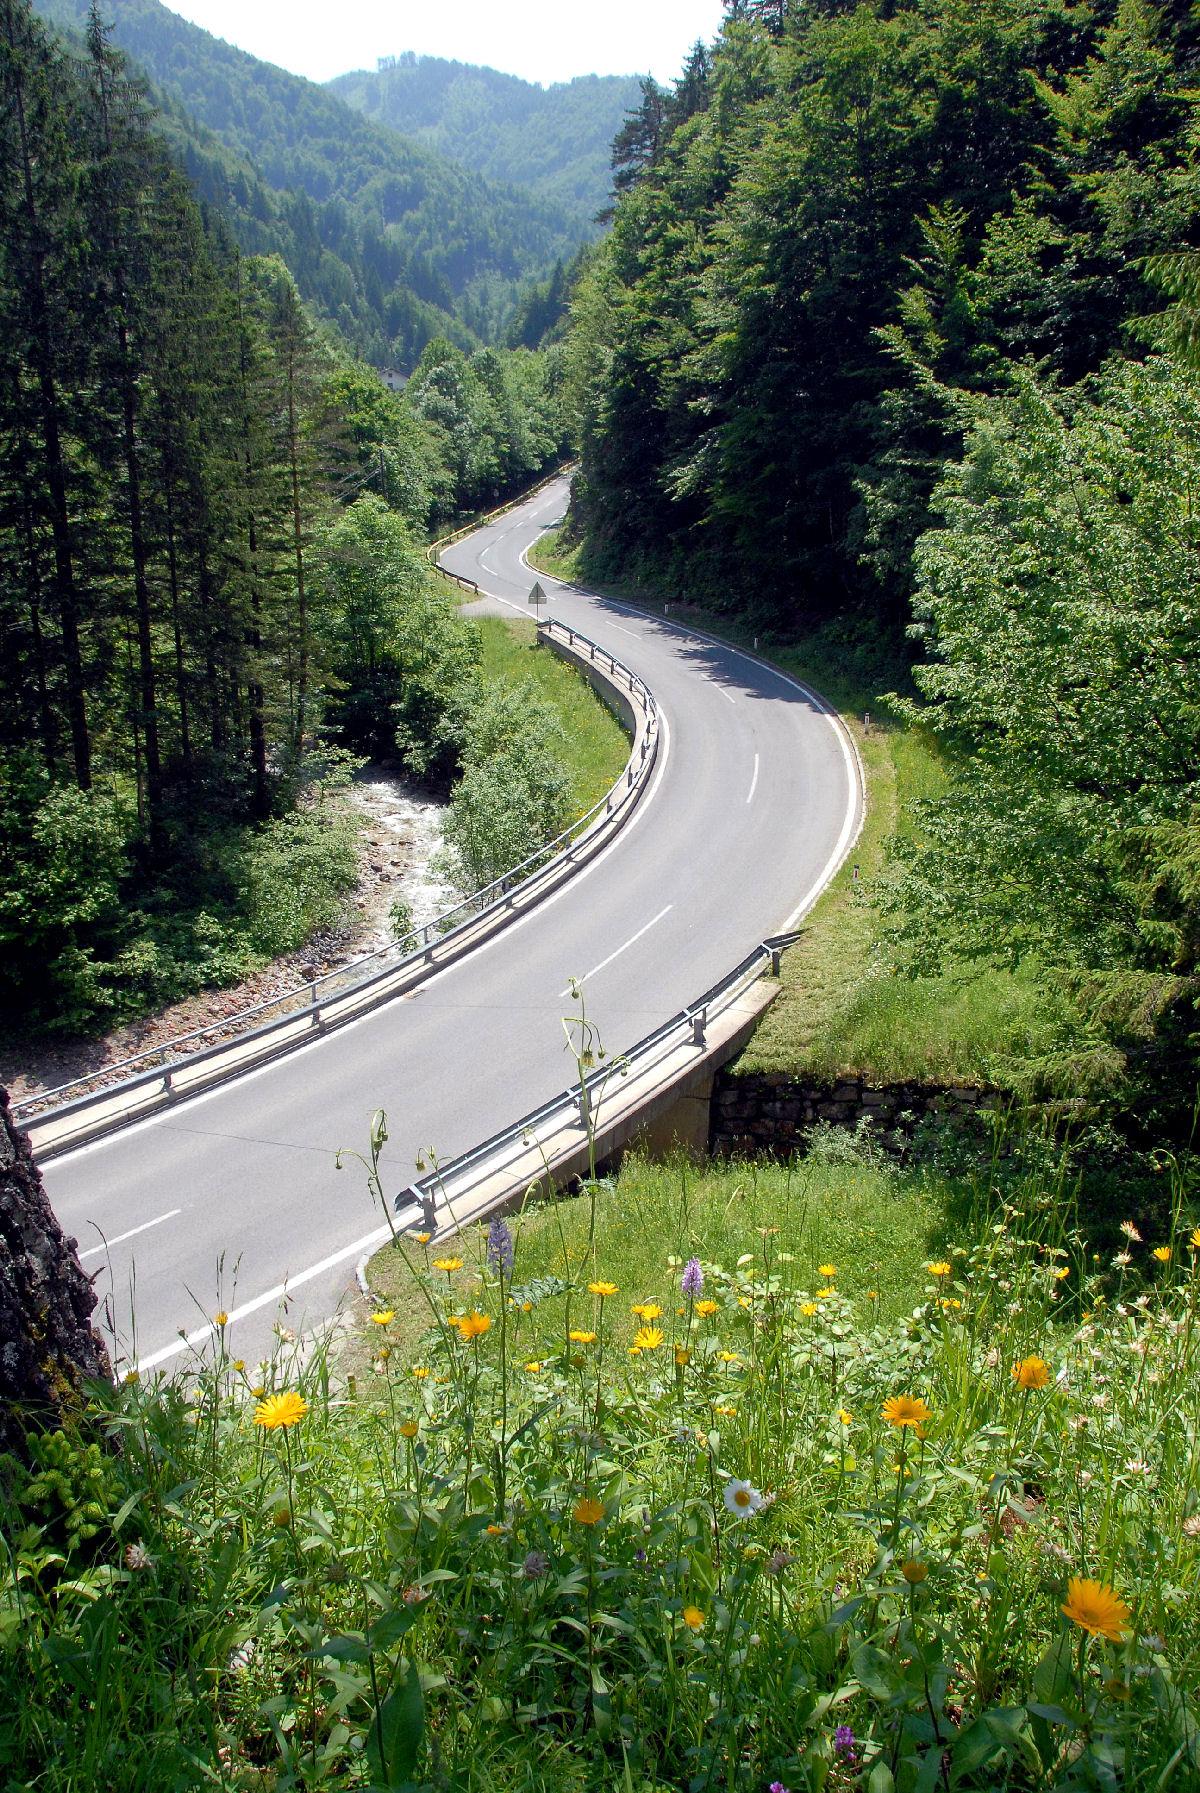 Loiblpass road